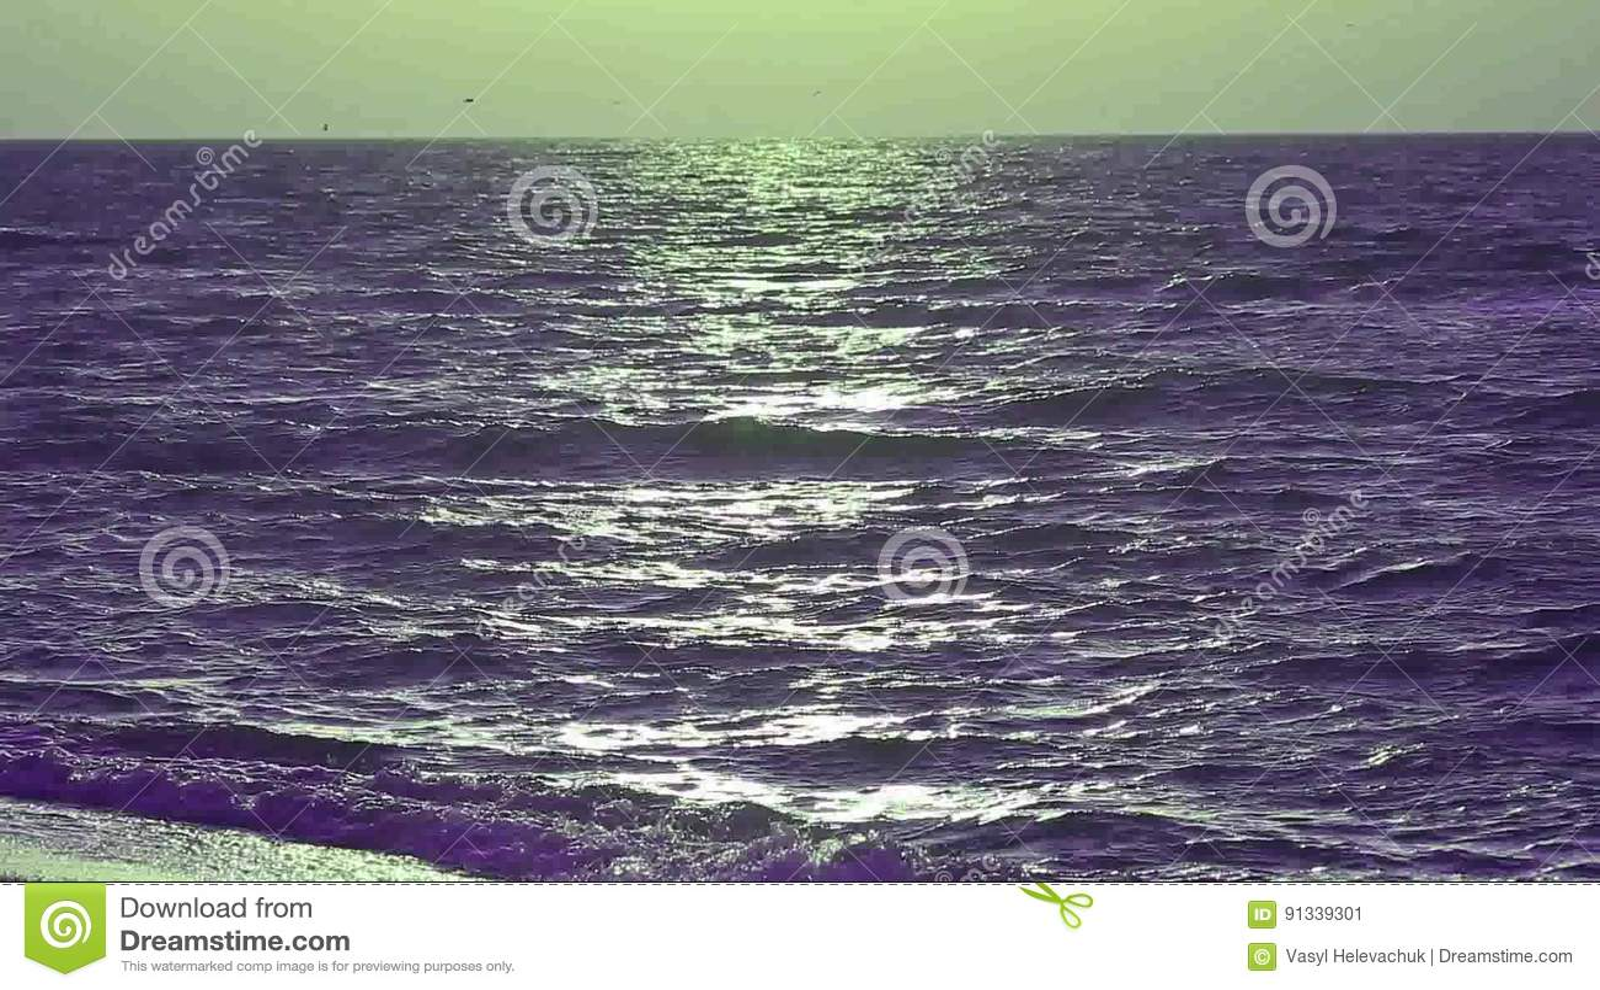 Sea sound audio